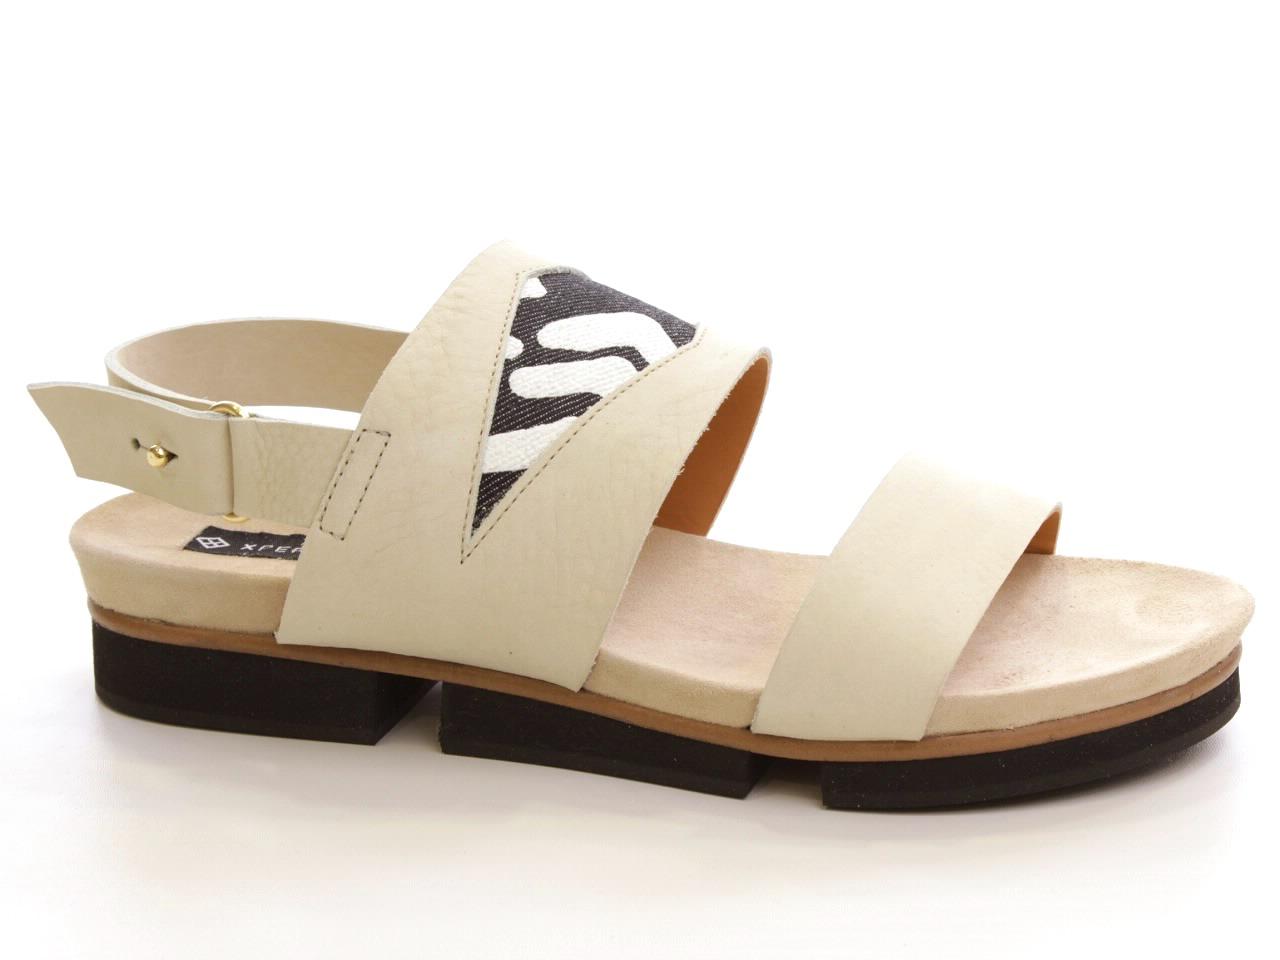 Sandales Plates Xperimental - 638 KAMI CET